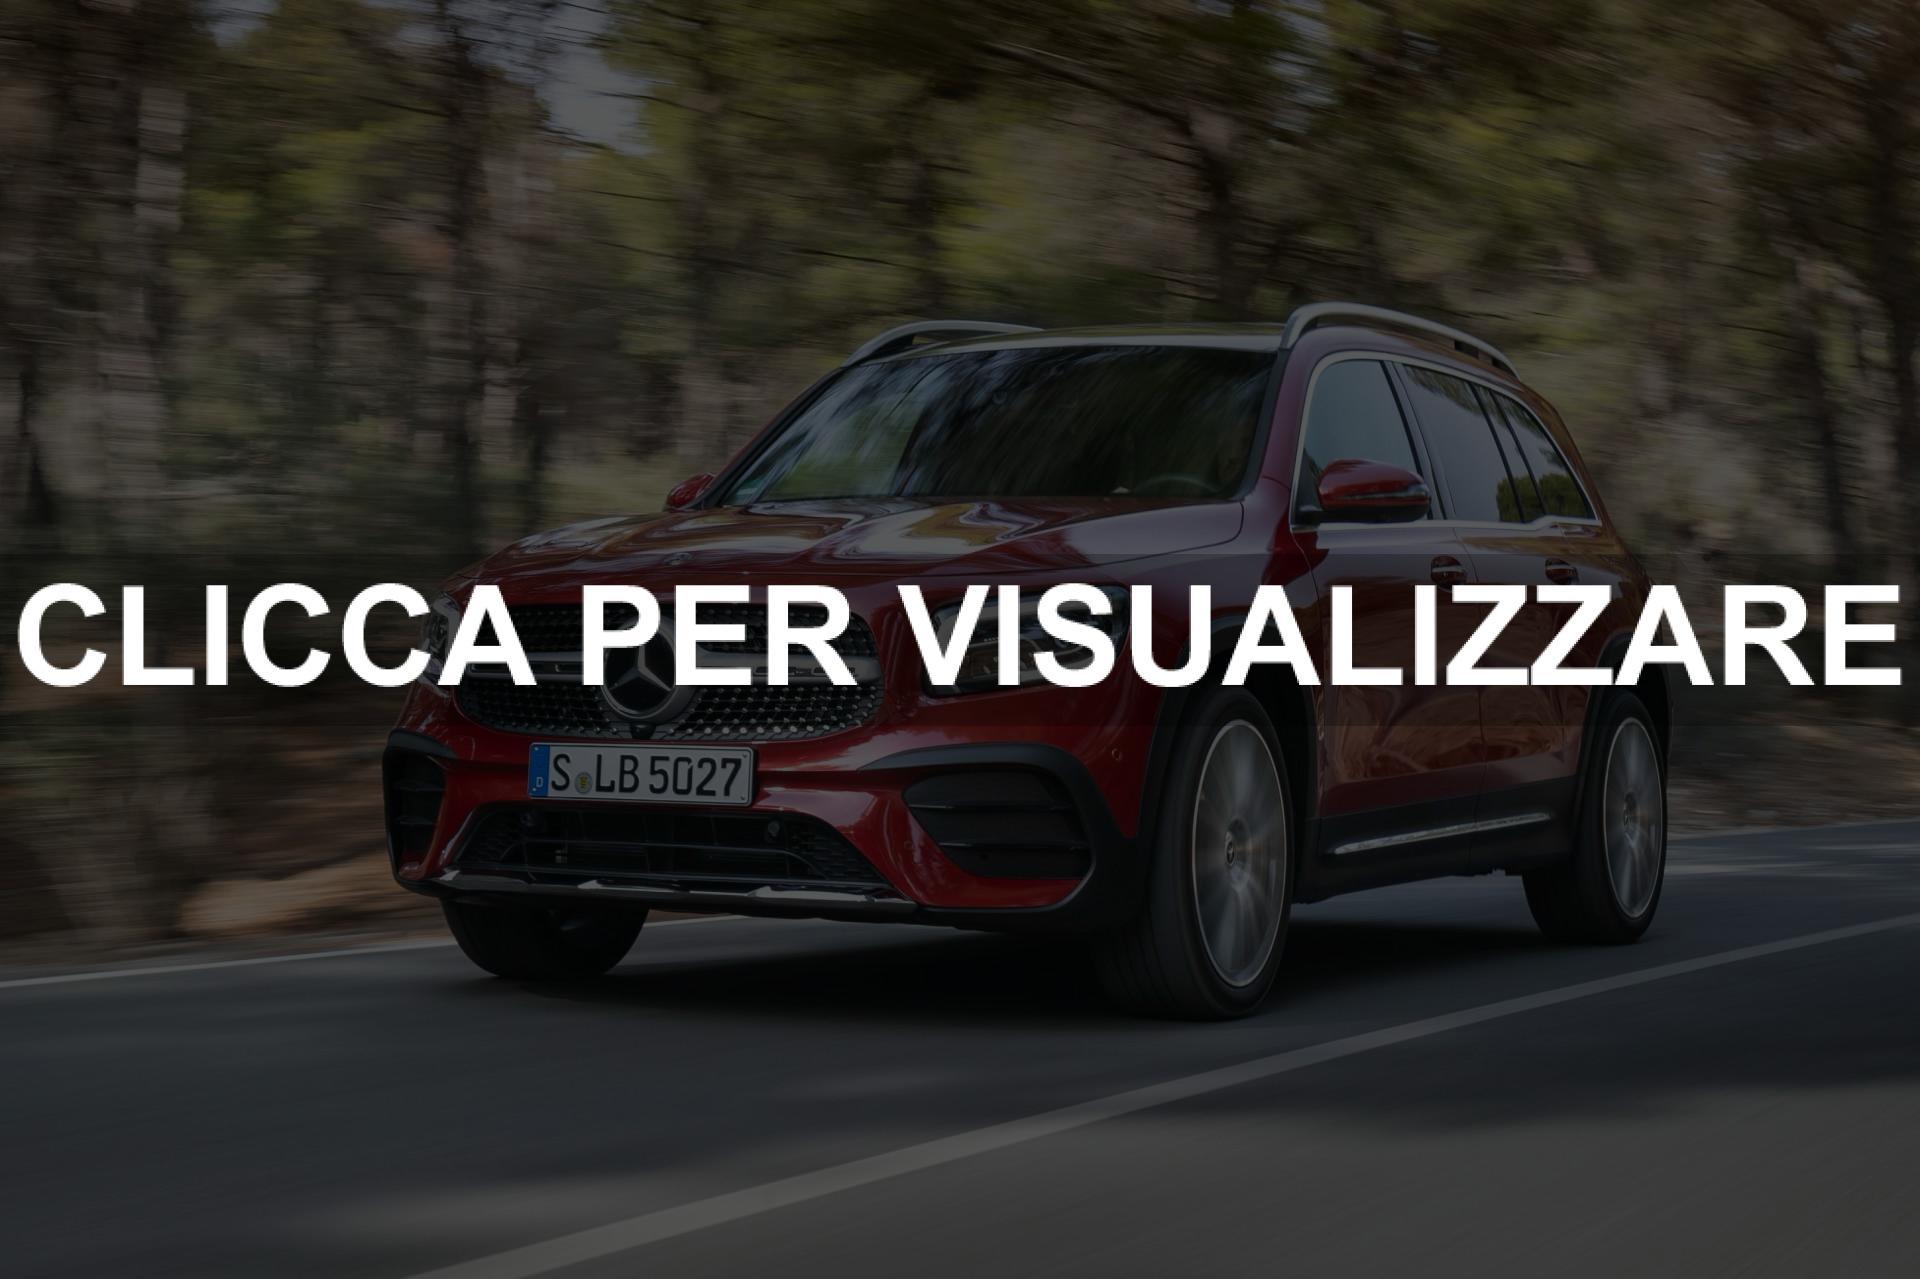 Immagine Frontale nuovo Mercedes GLB